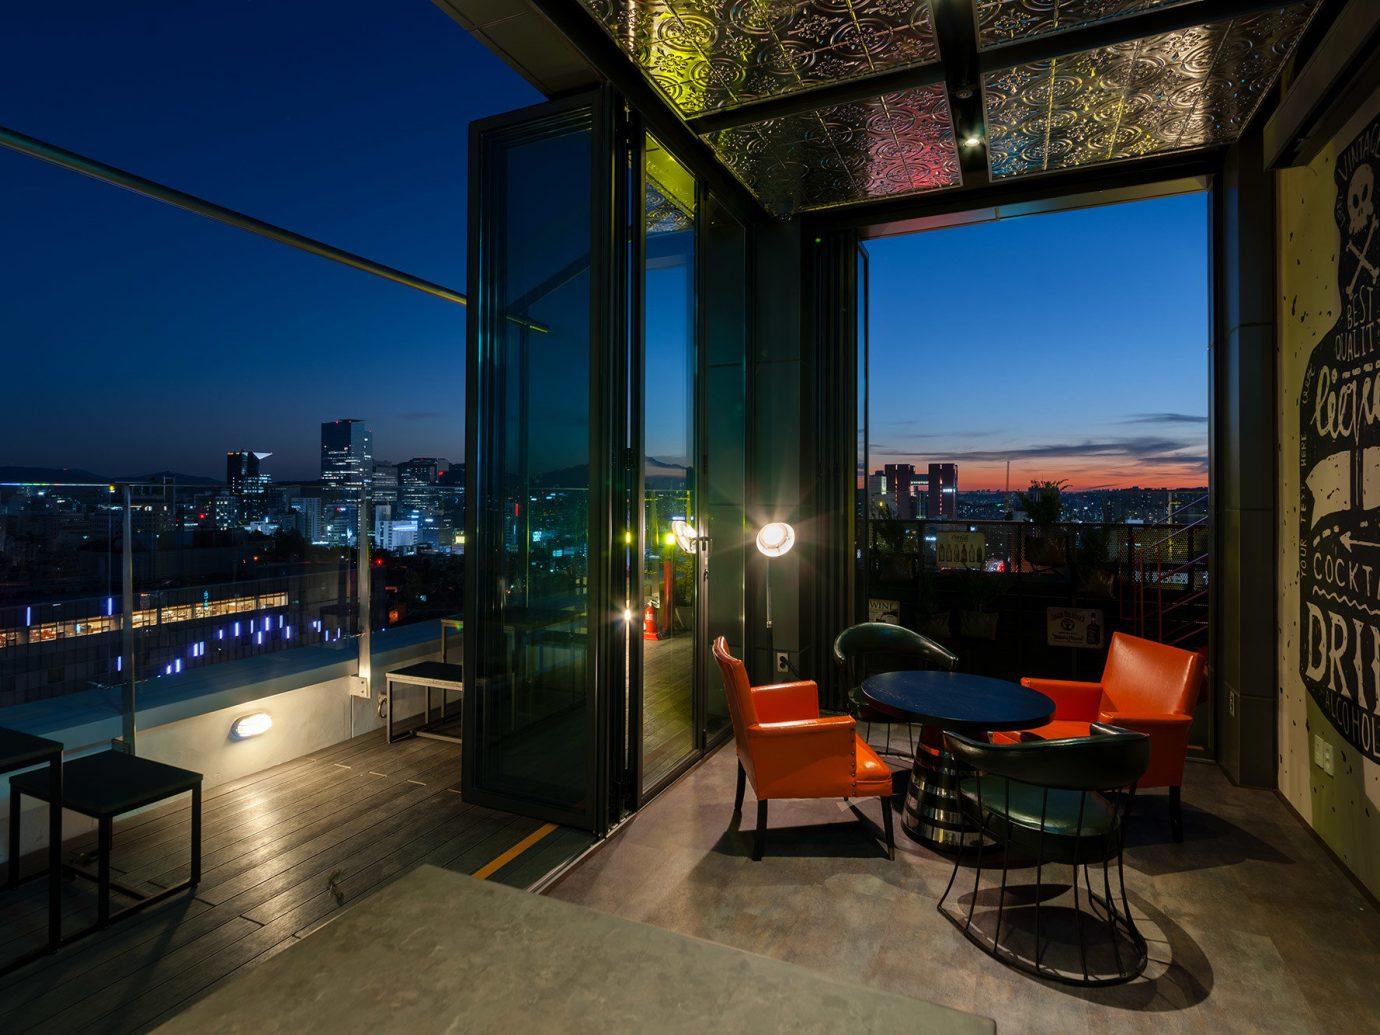 Hotels Luxury Travel floor building Architecture sky real estate home apartment interior design window condominium house Balcony hotel penthouse apartment roof